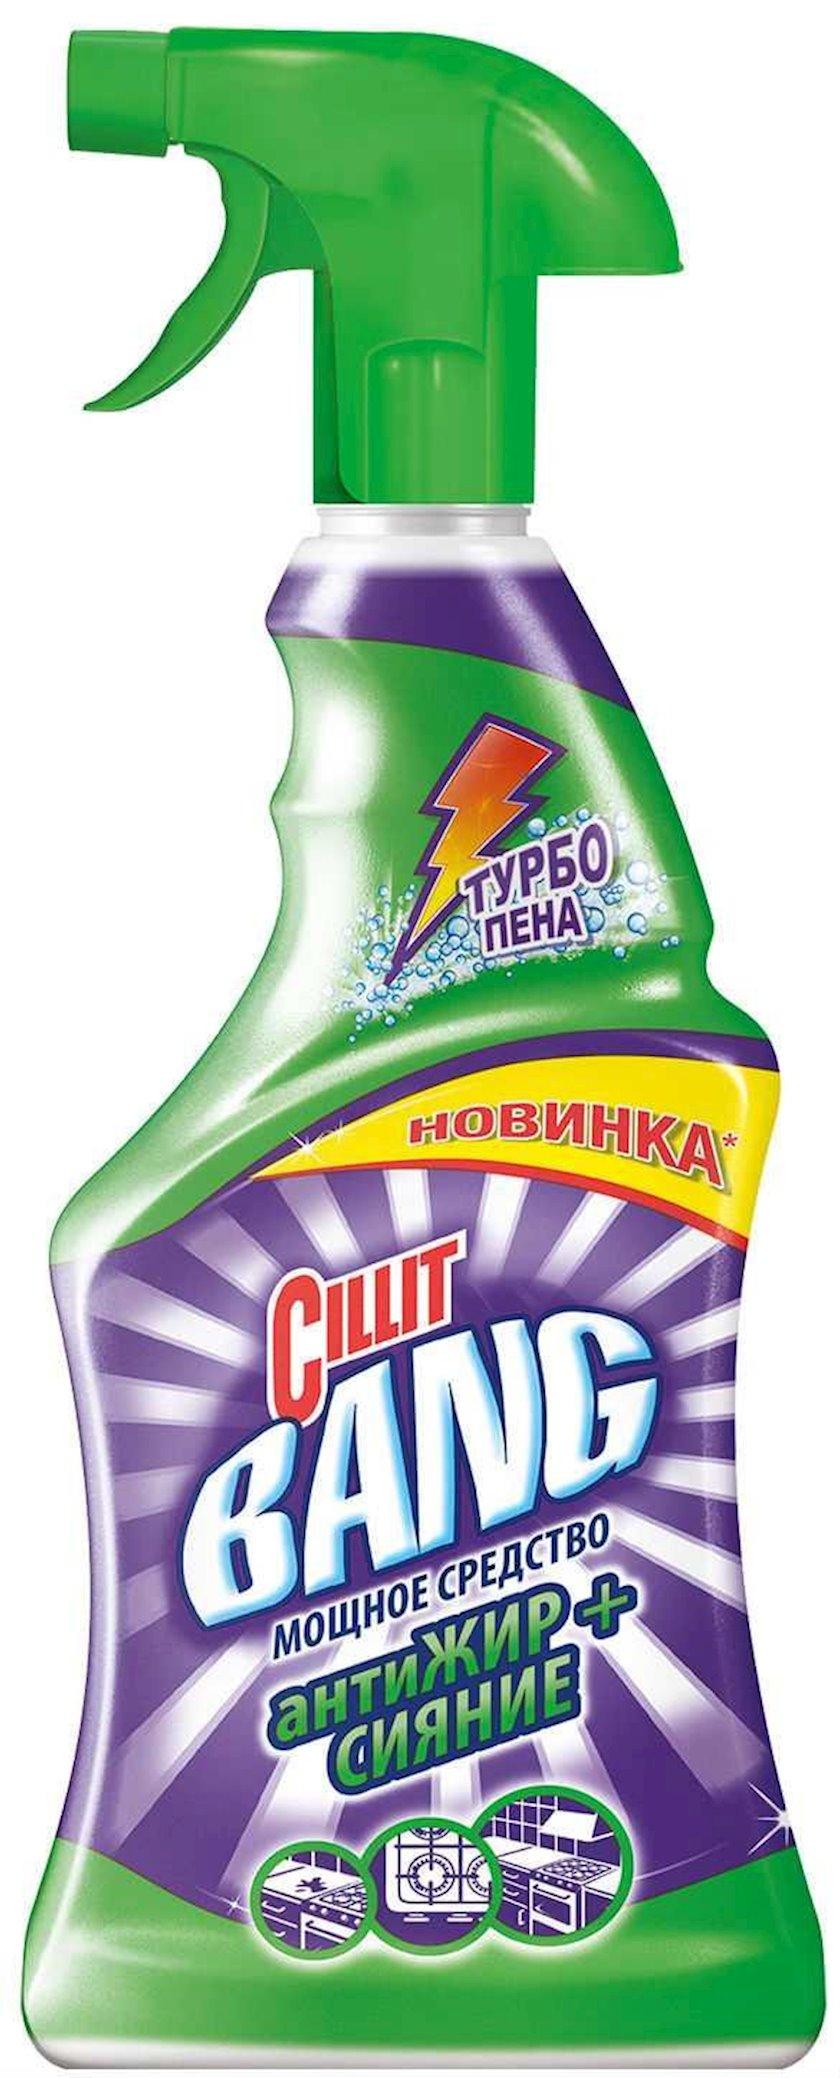 Чистящее средство для кухни Cillit Bang  Антижир+Сияние, Cпрей, 750 мл